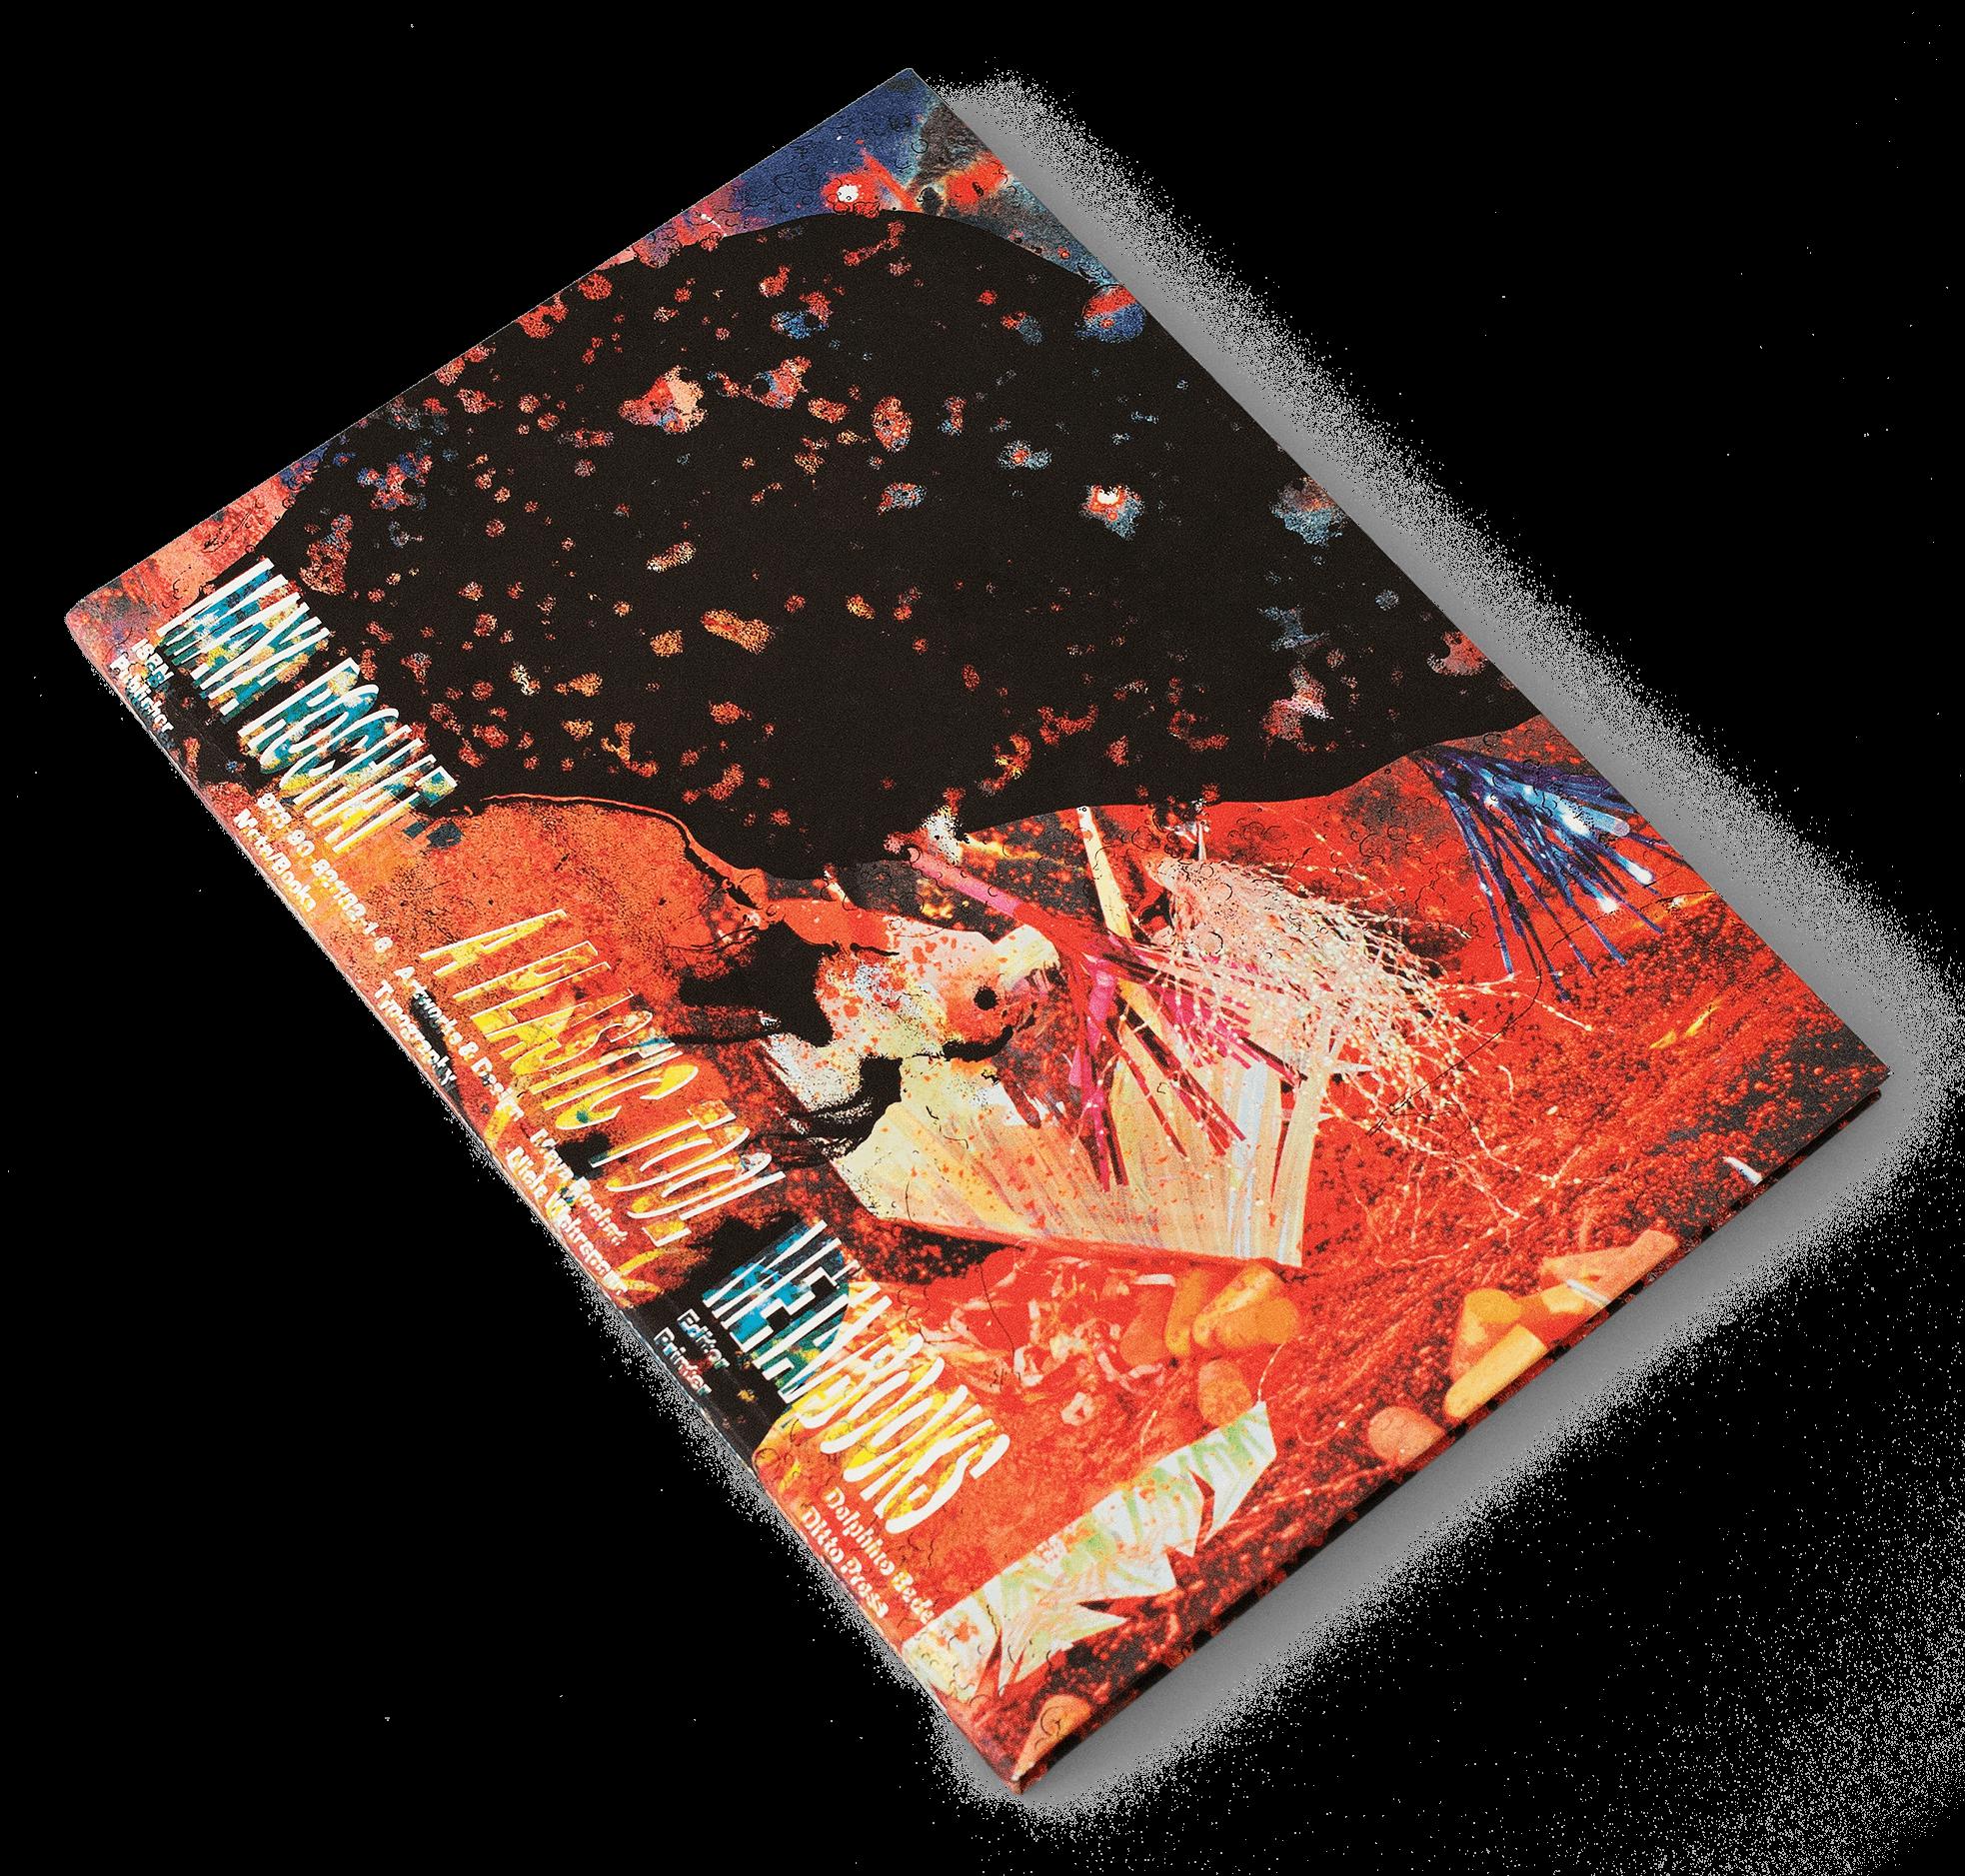 Maya Rochat, A Plastic Tool, livre (couverture)